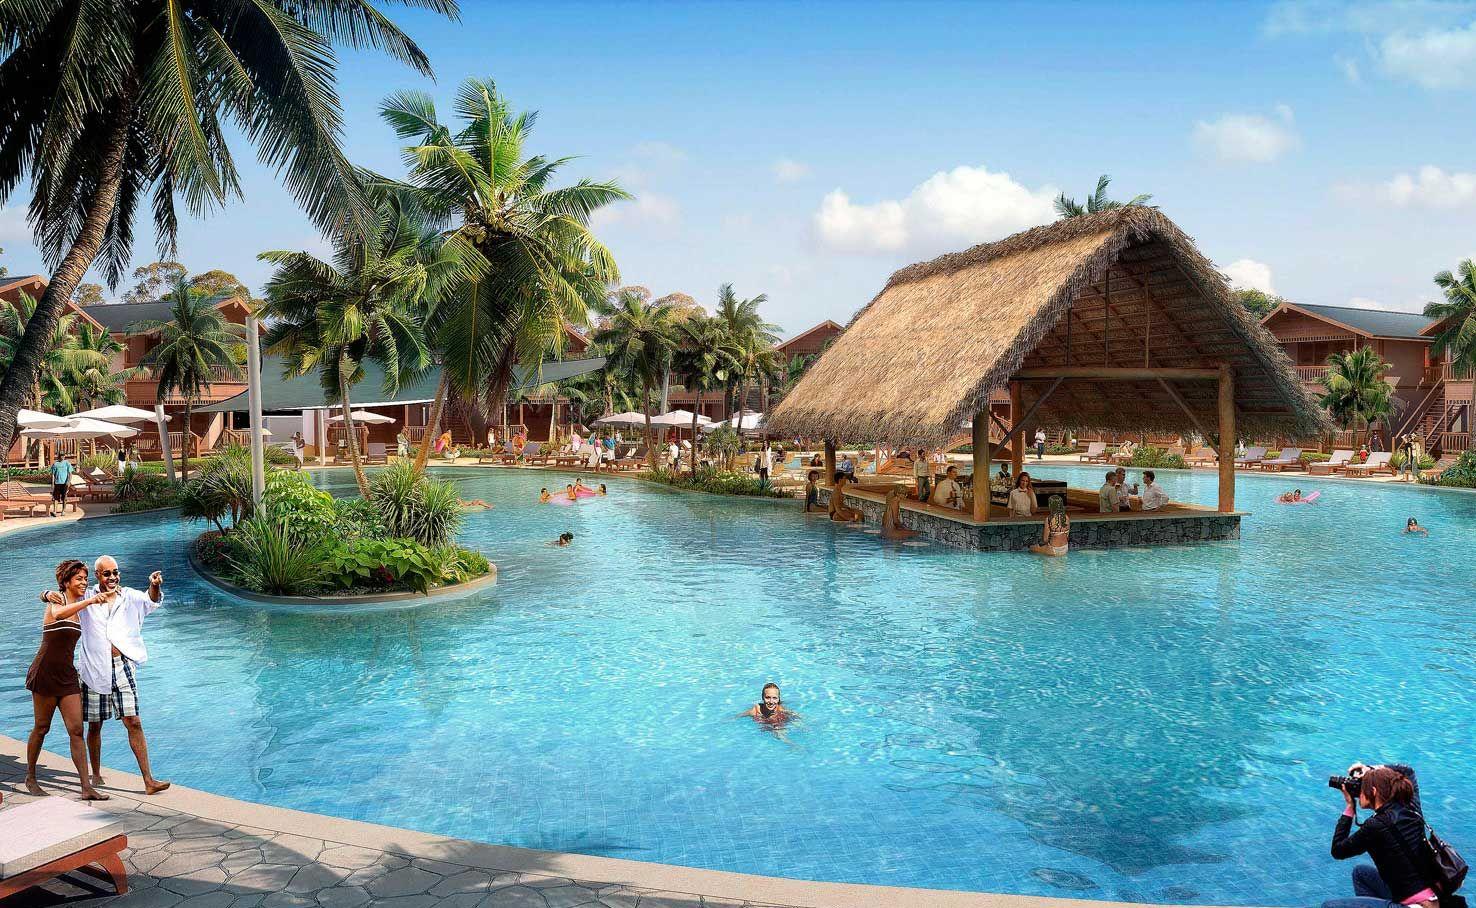 An artist impression of the swimming area at Samudra Resort Whitsundays.